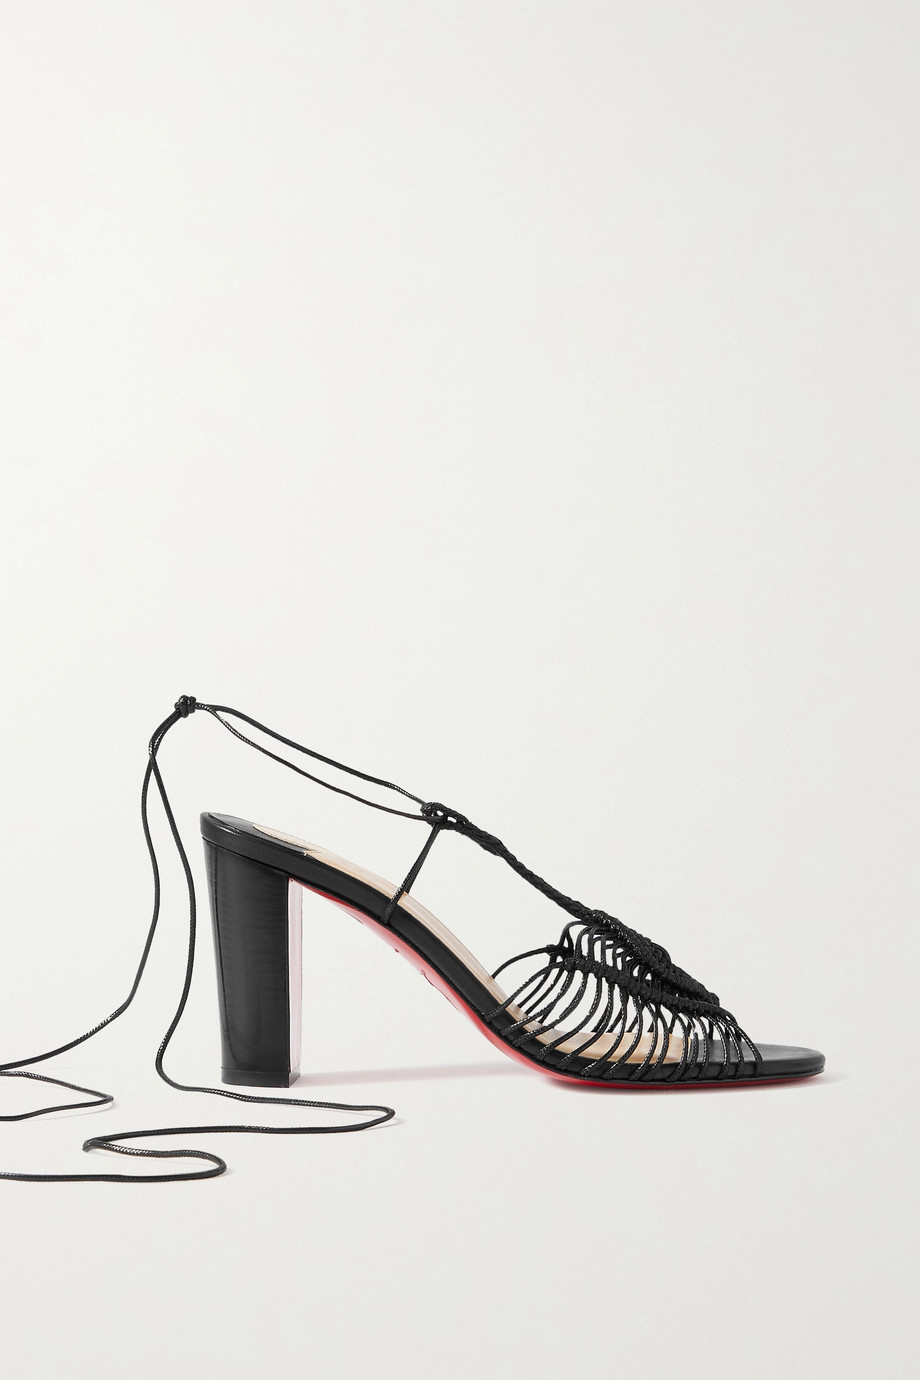 Christian Louboutin Janis in Heels 85 macramé cotton sandals